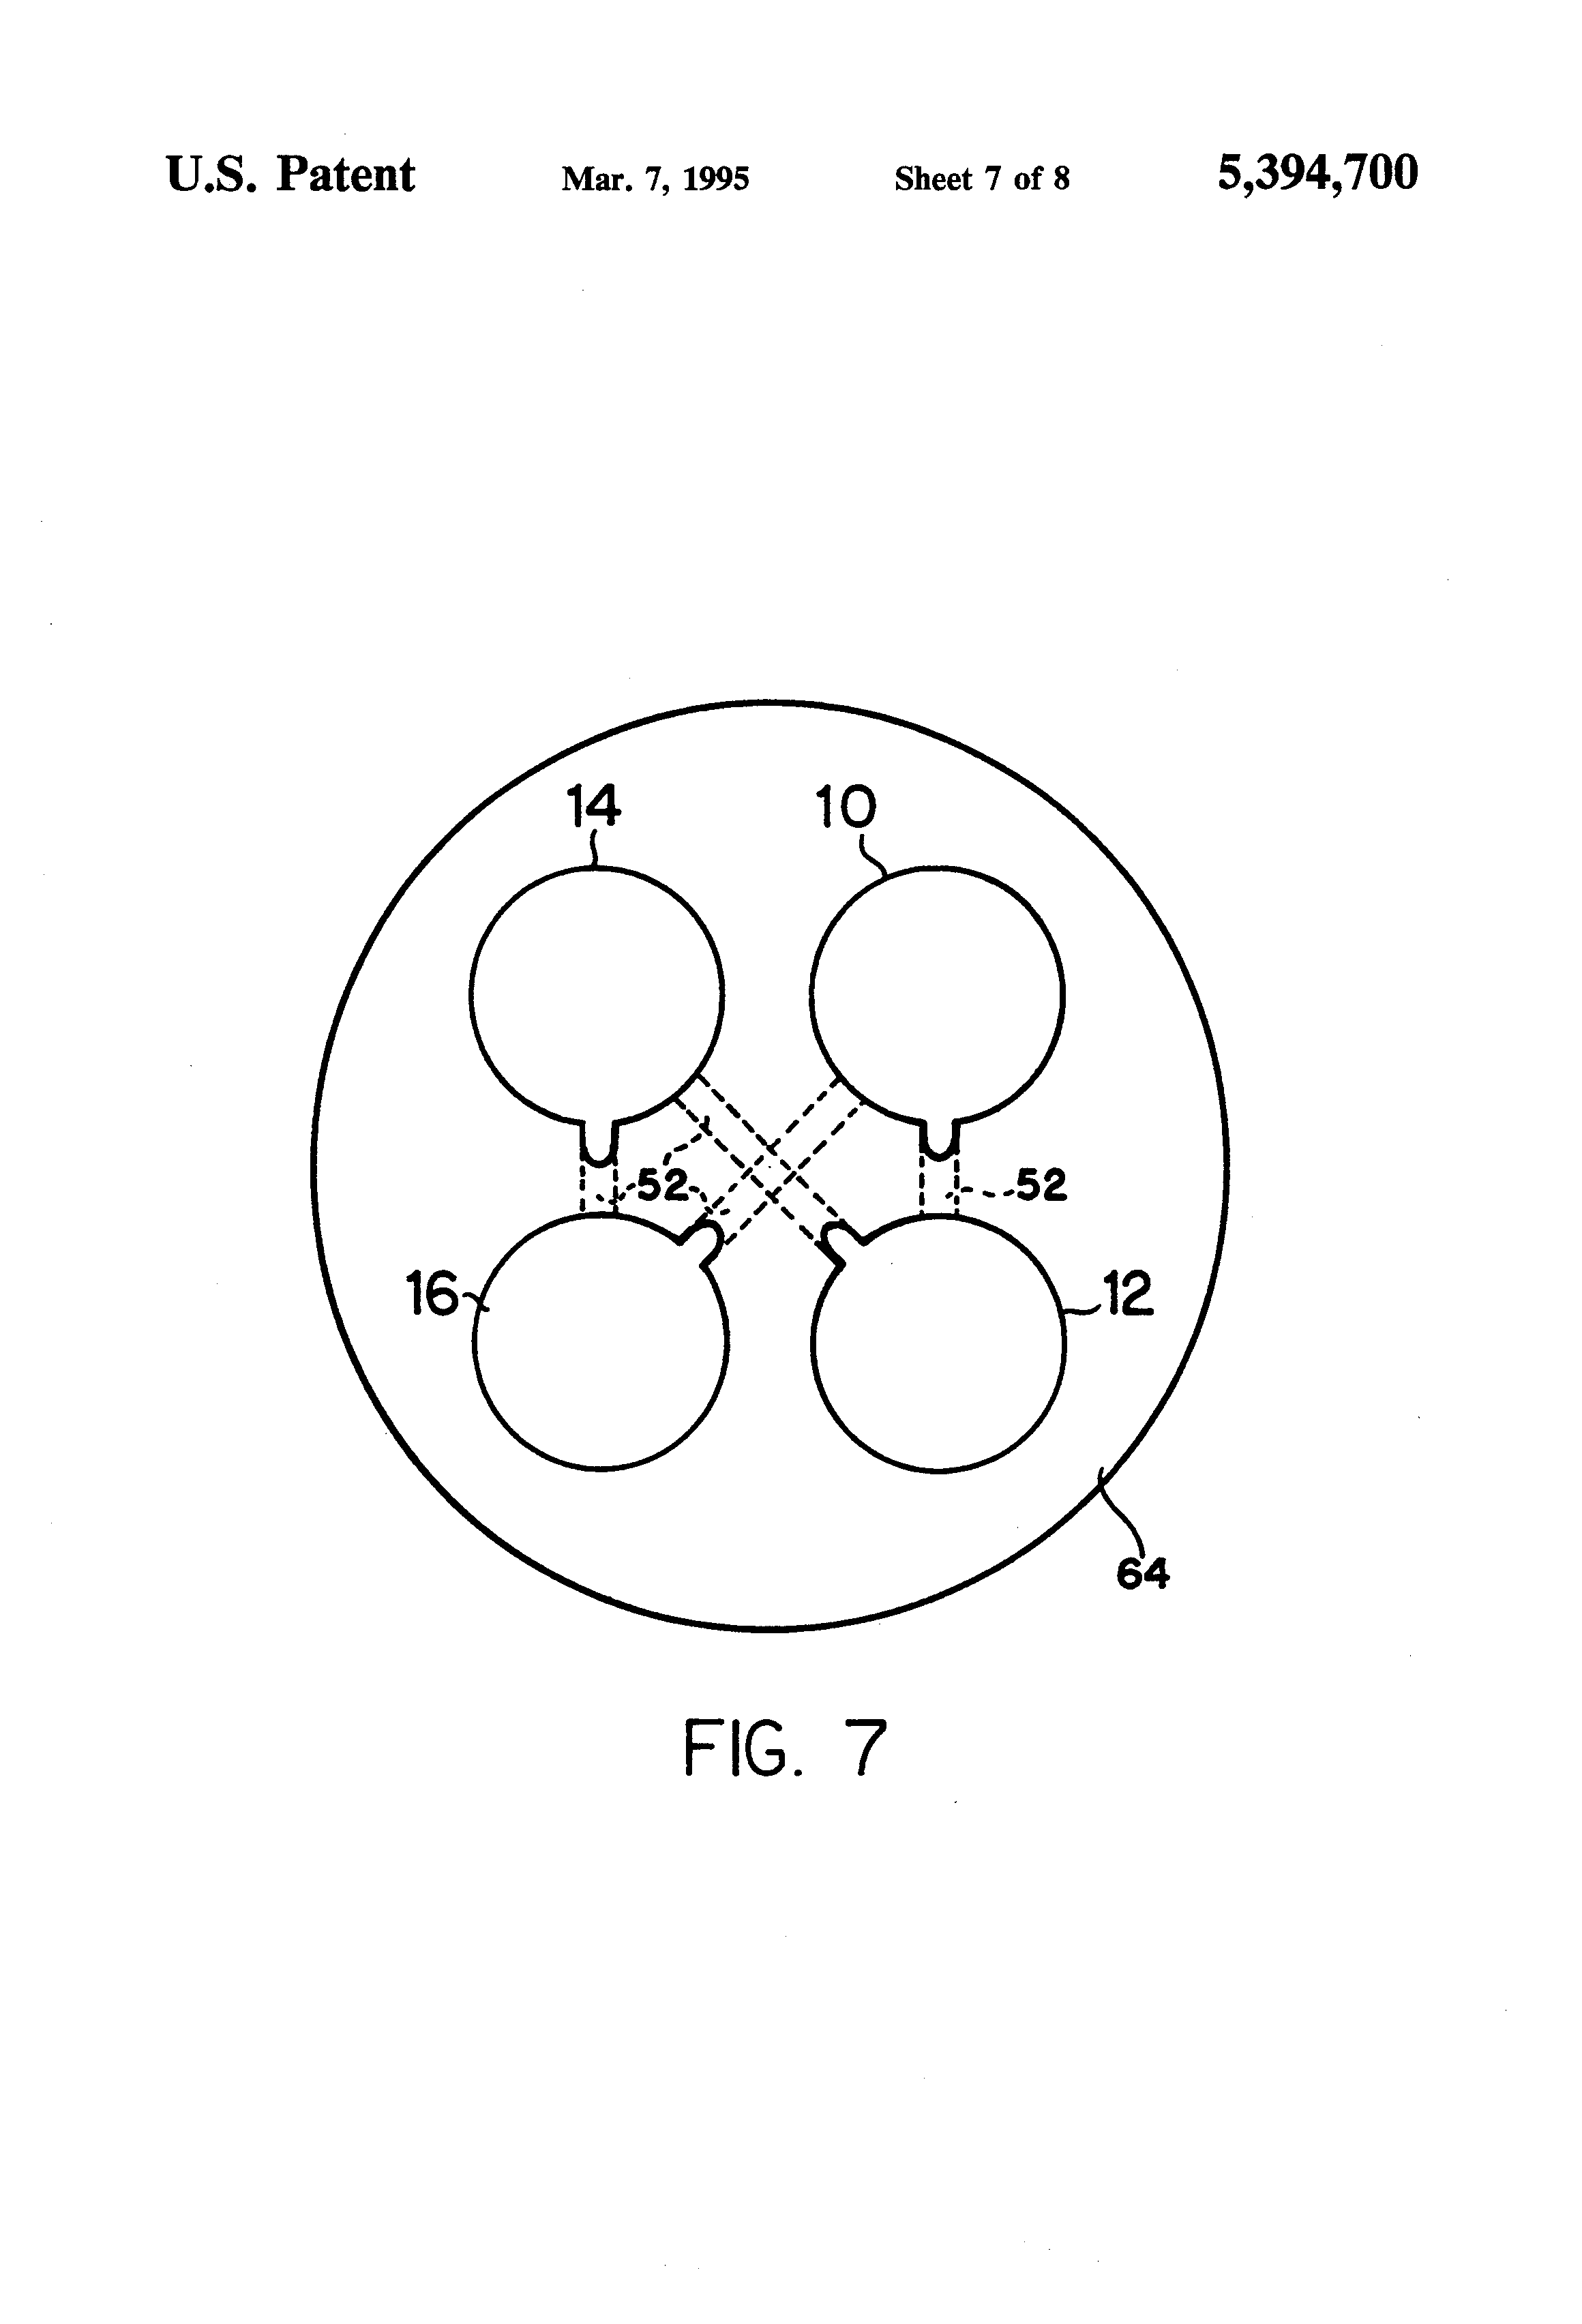 pv diagram for a piston chevrolet 350 engine four stirling imageresizertool com